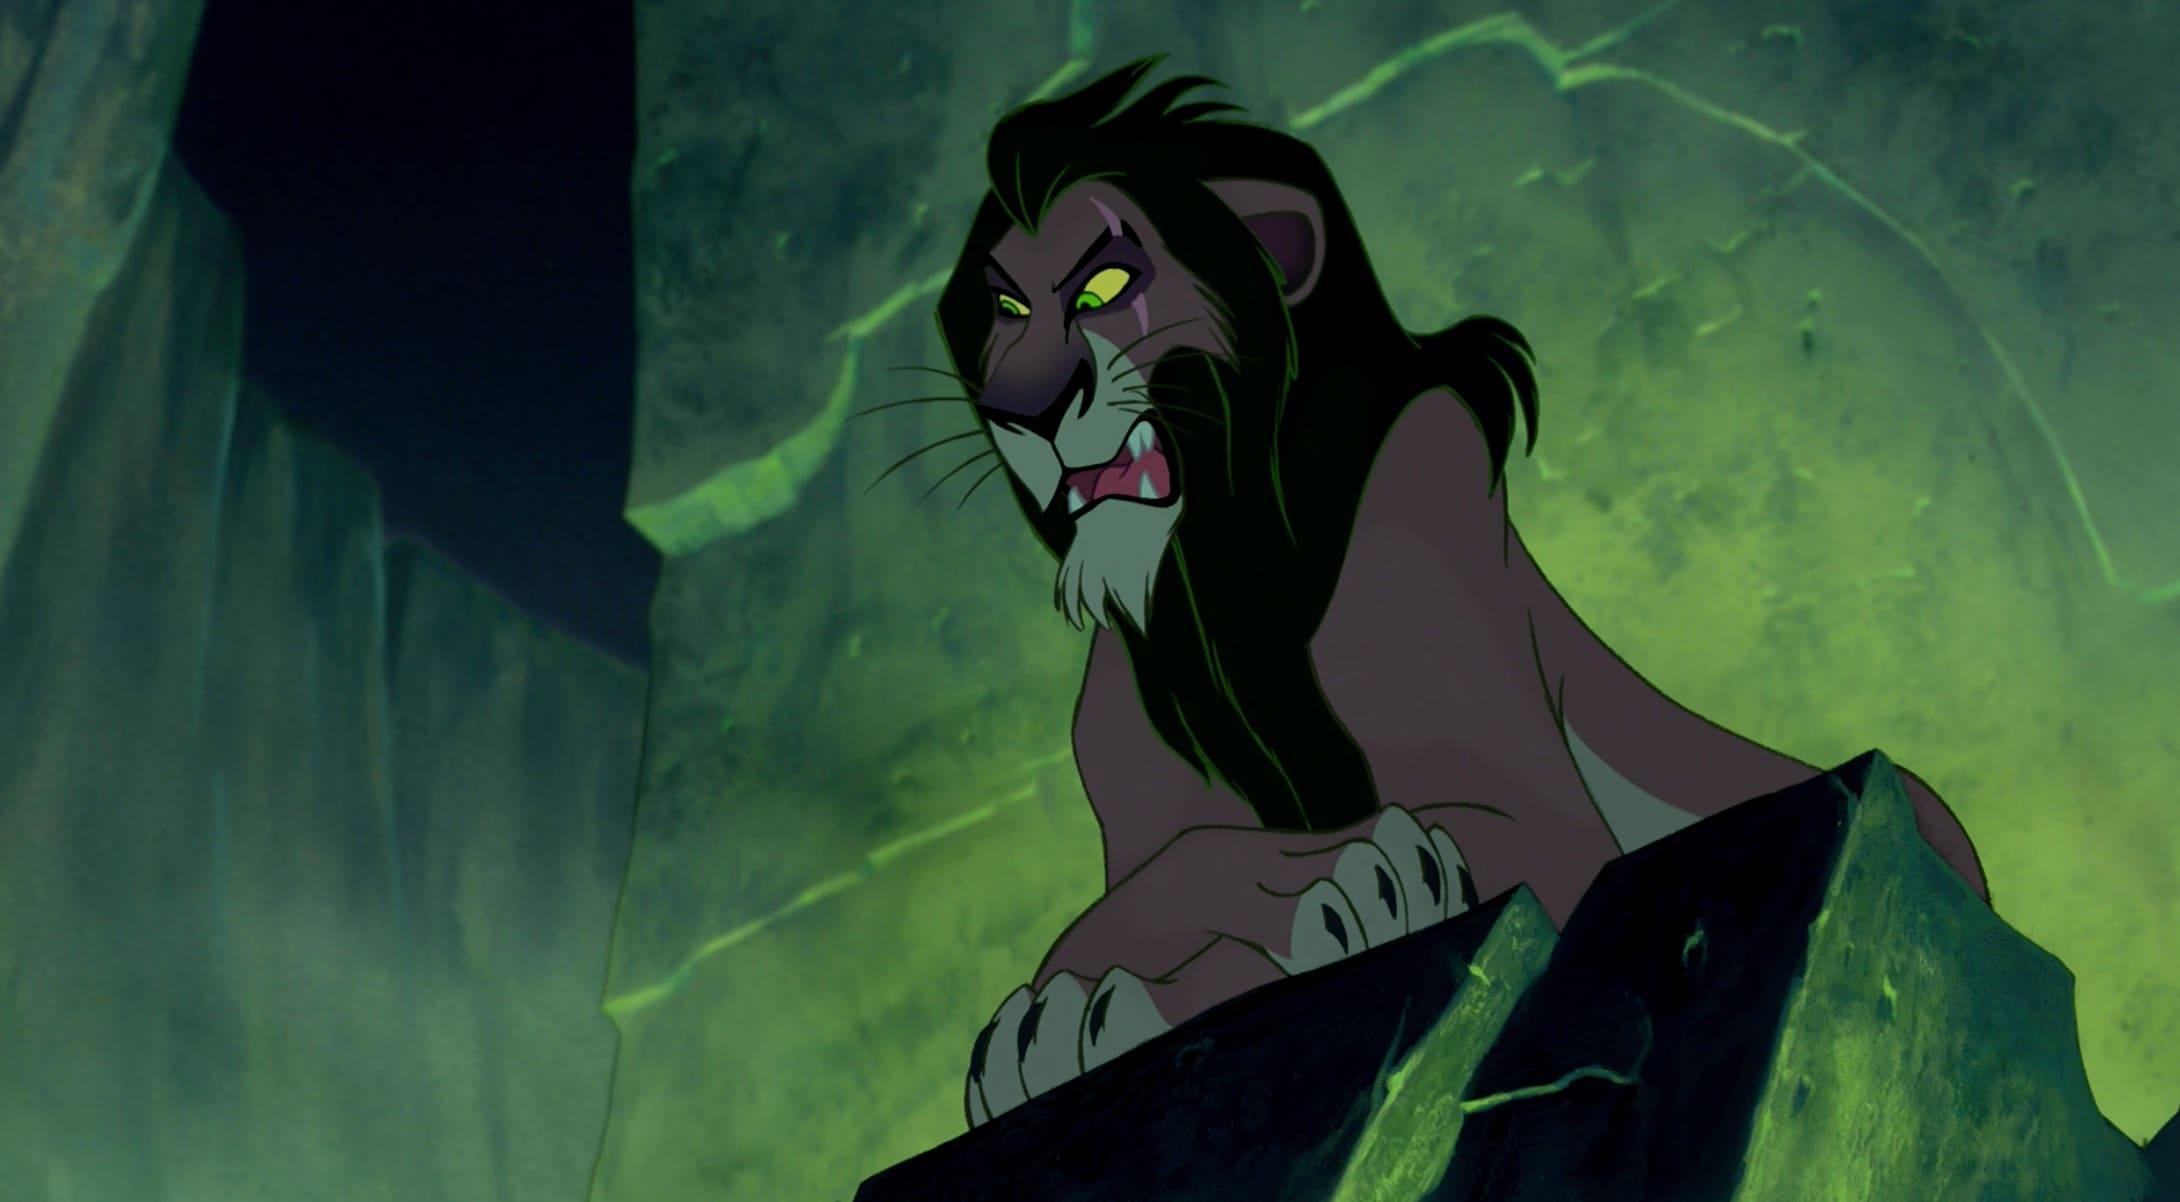 In Defense of Scar | Oh My Disney